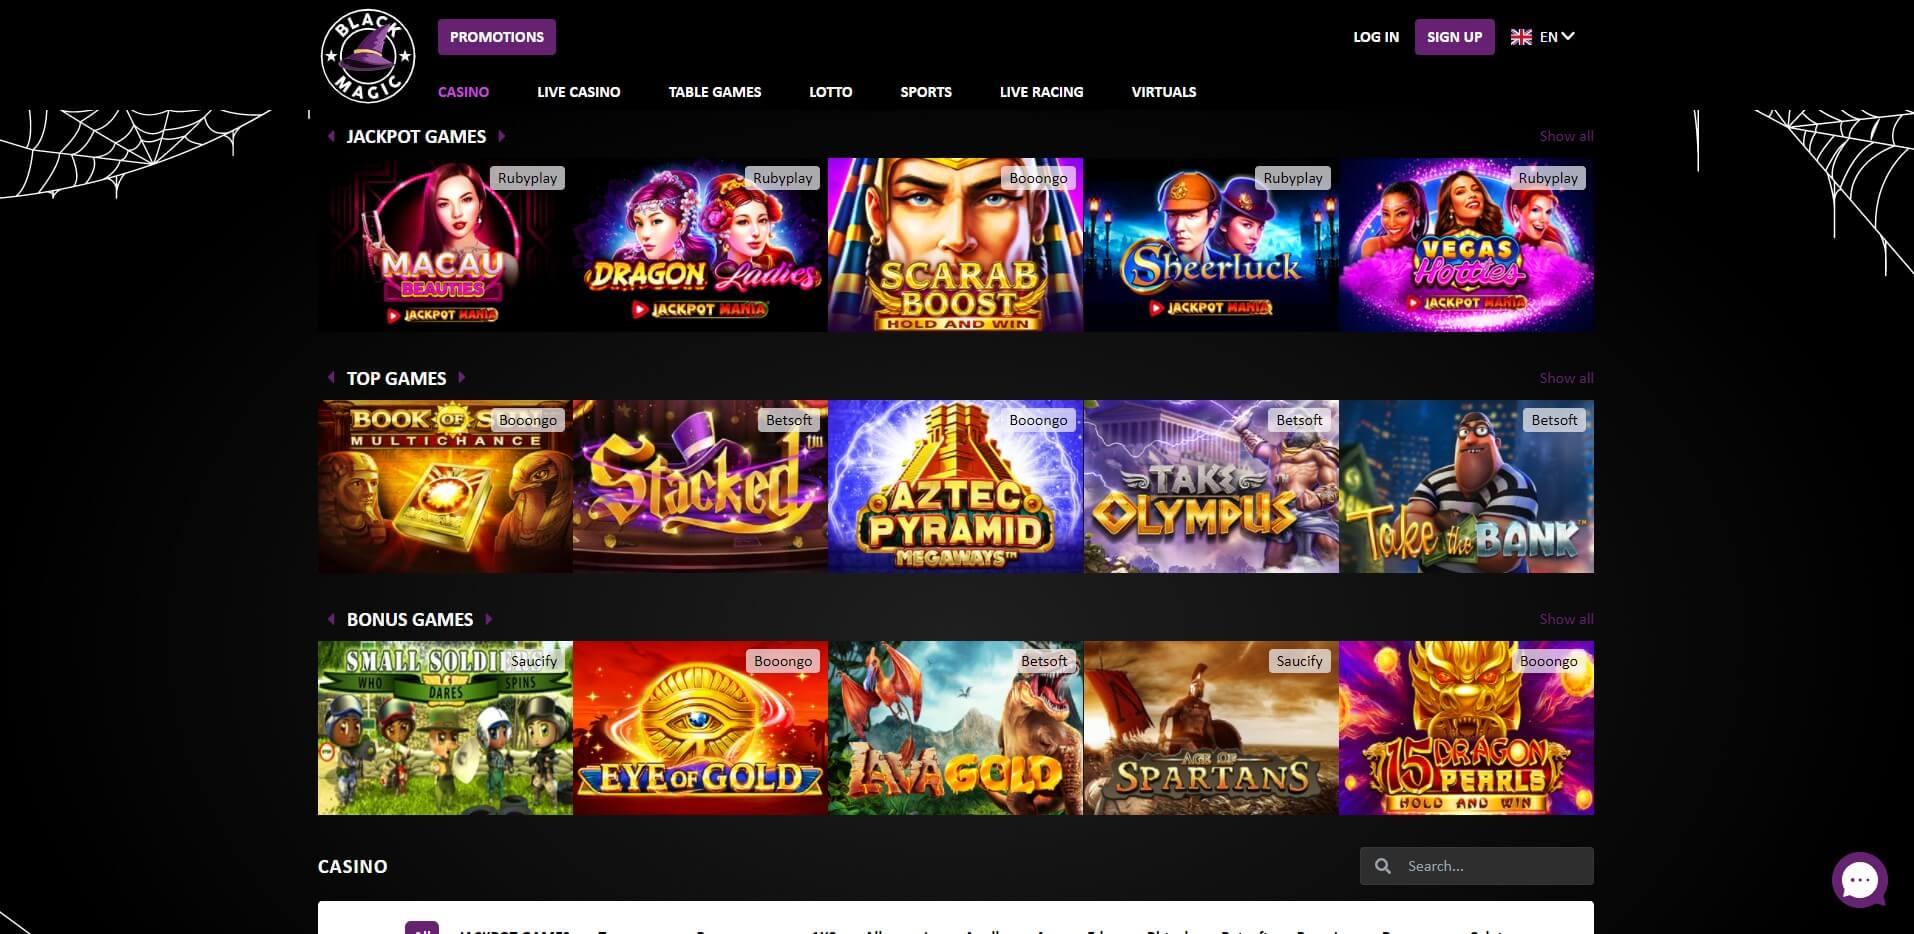 Games at Black Magic Casino